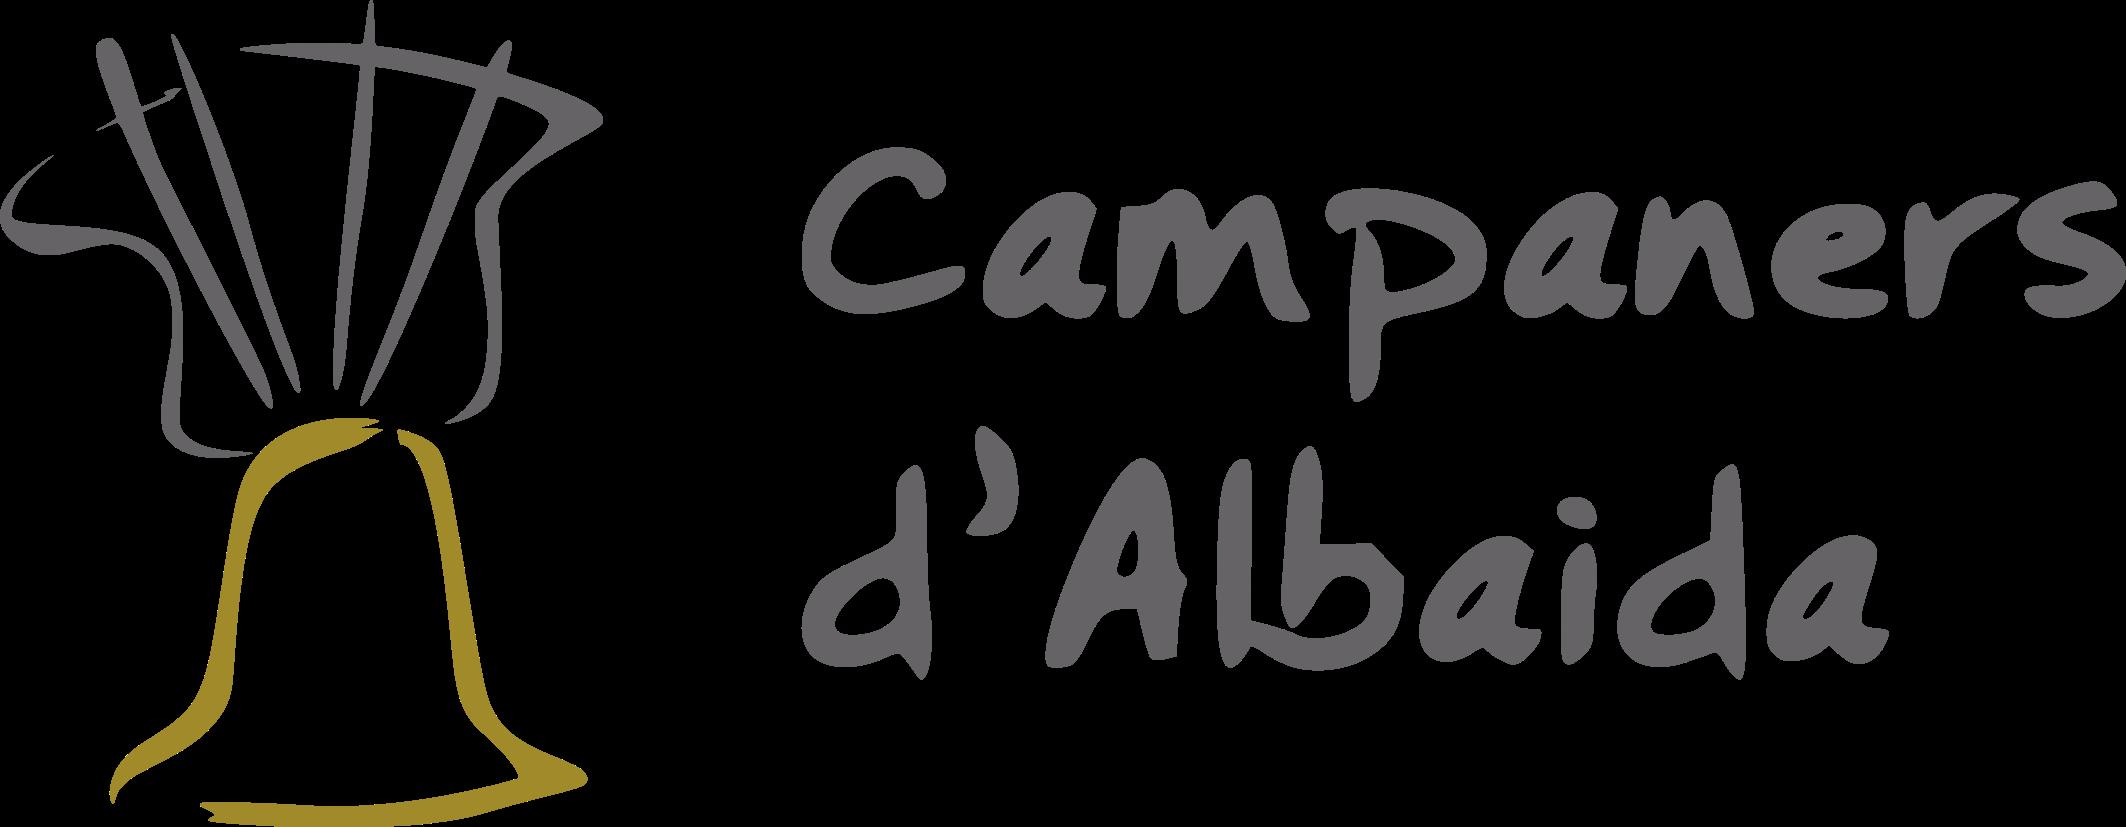 Campaners d'Albaida